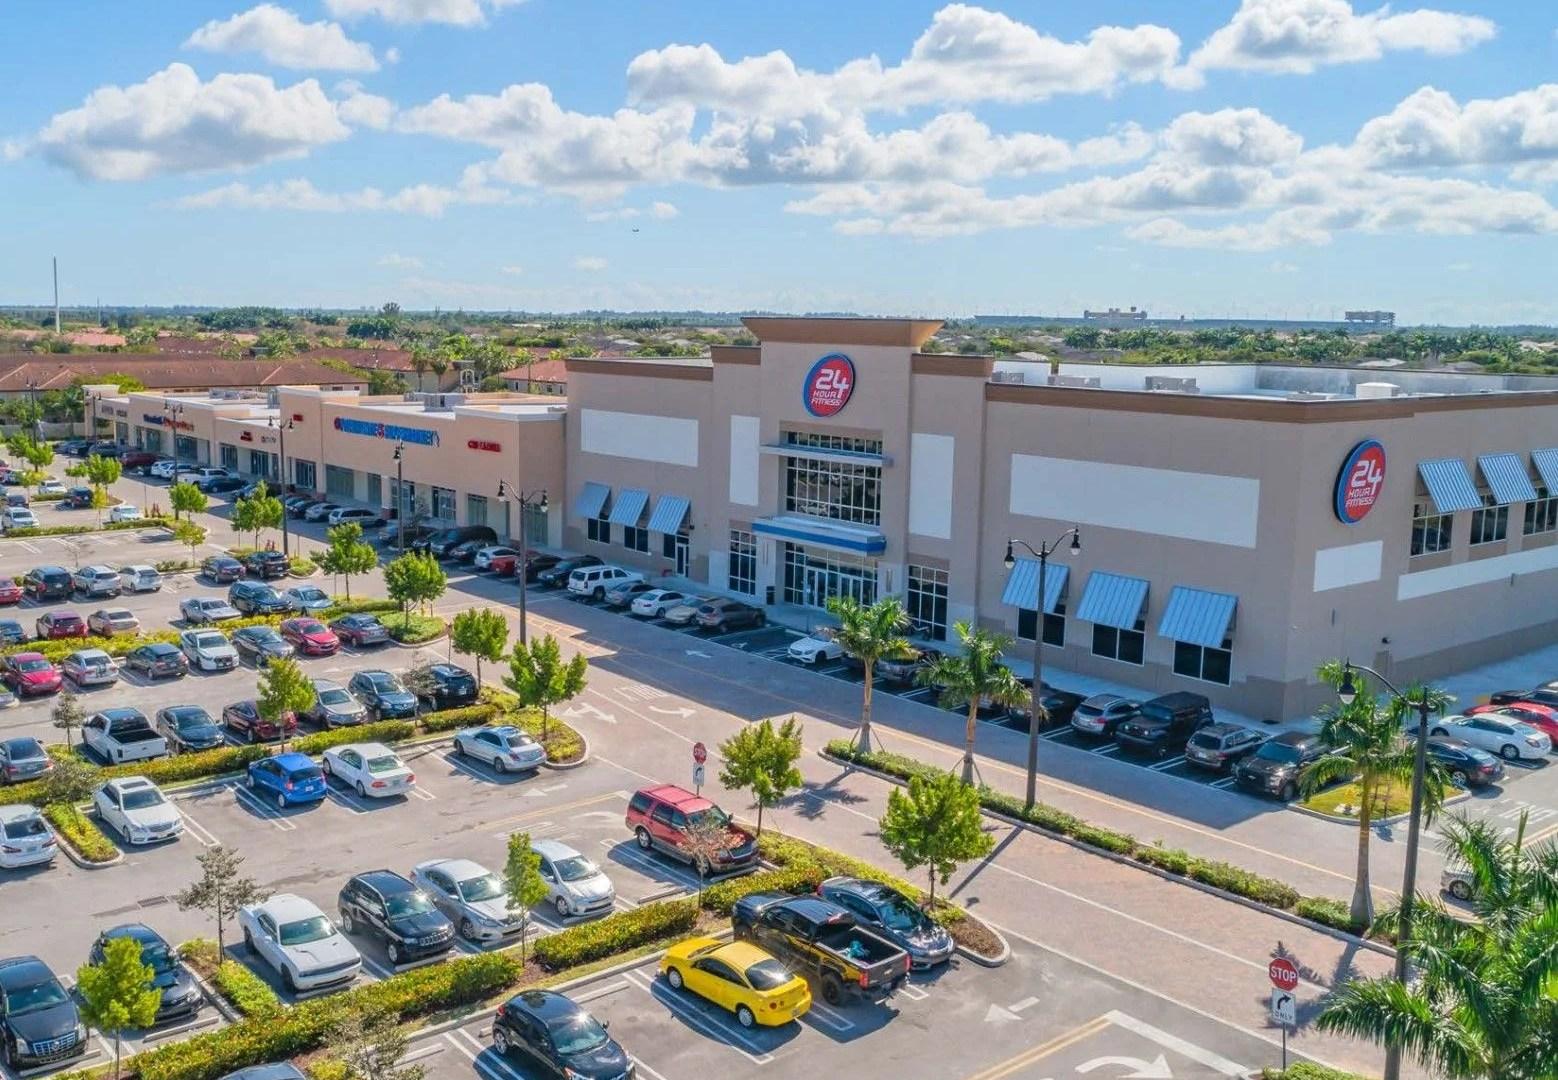 Top 25 South Florida Retail Shopping Center Transactions of 2020